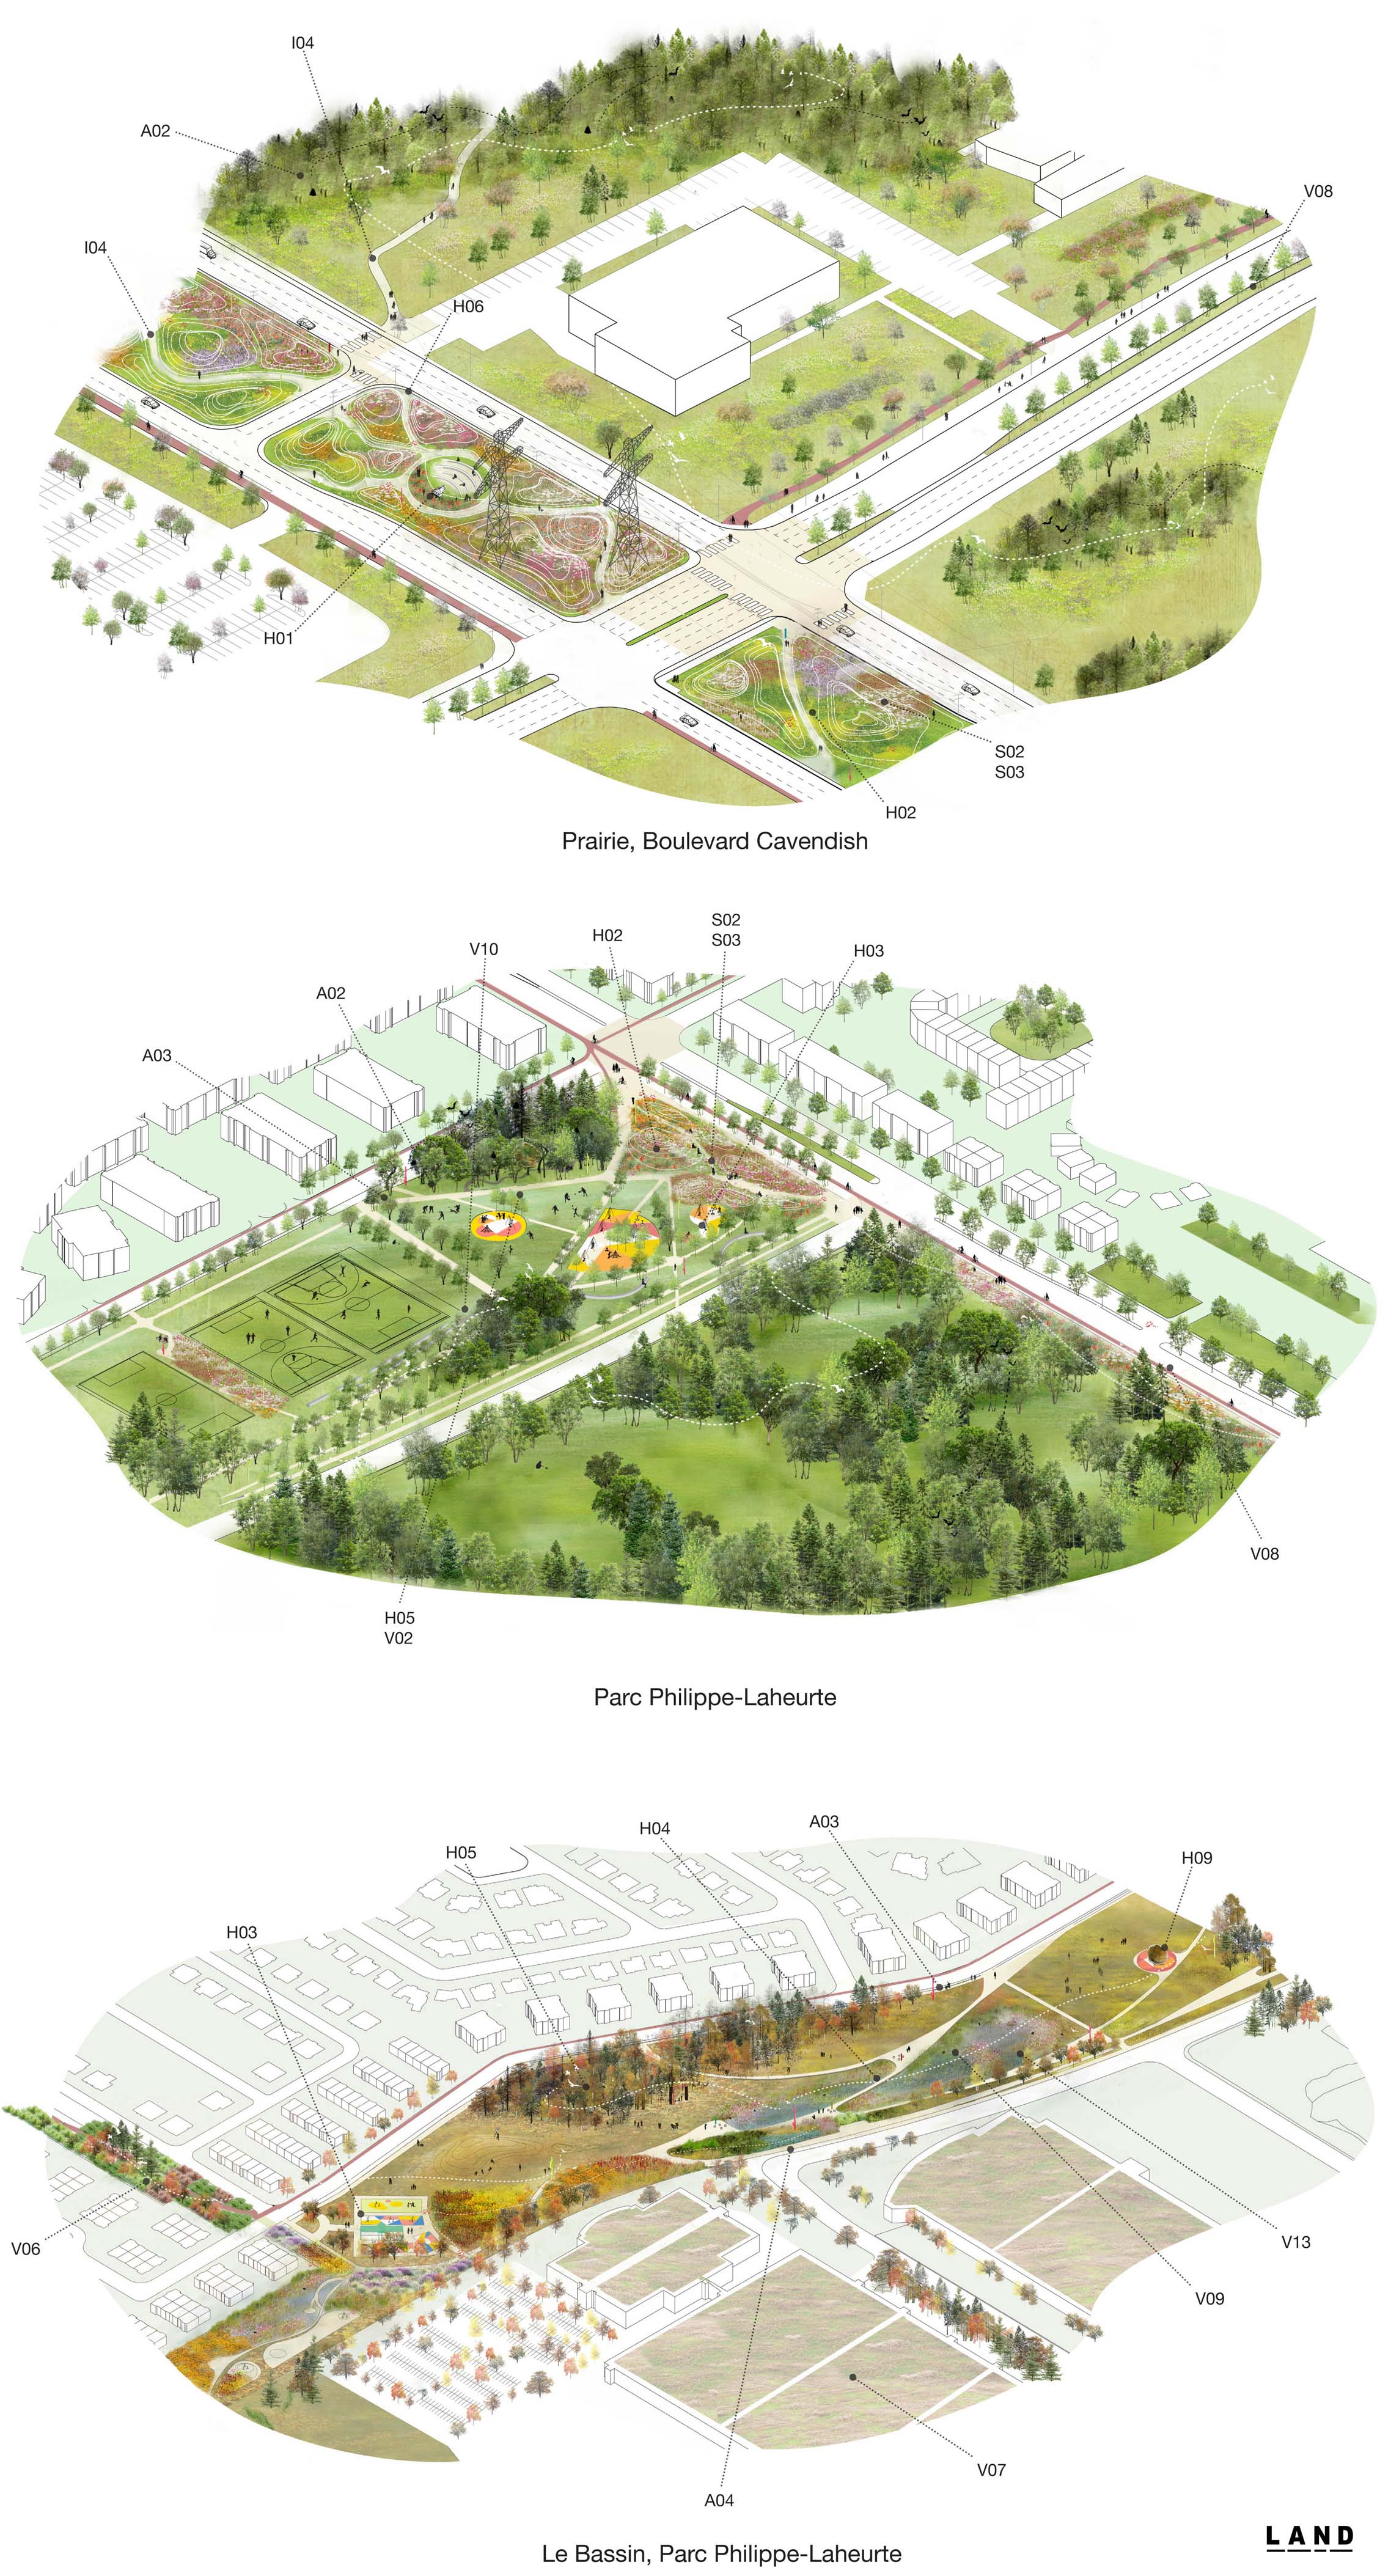 LAND_Corridor Biodiversité_Assonometrie.jpg